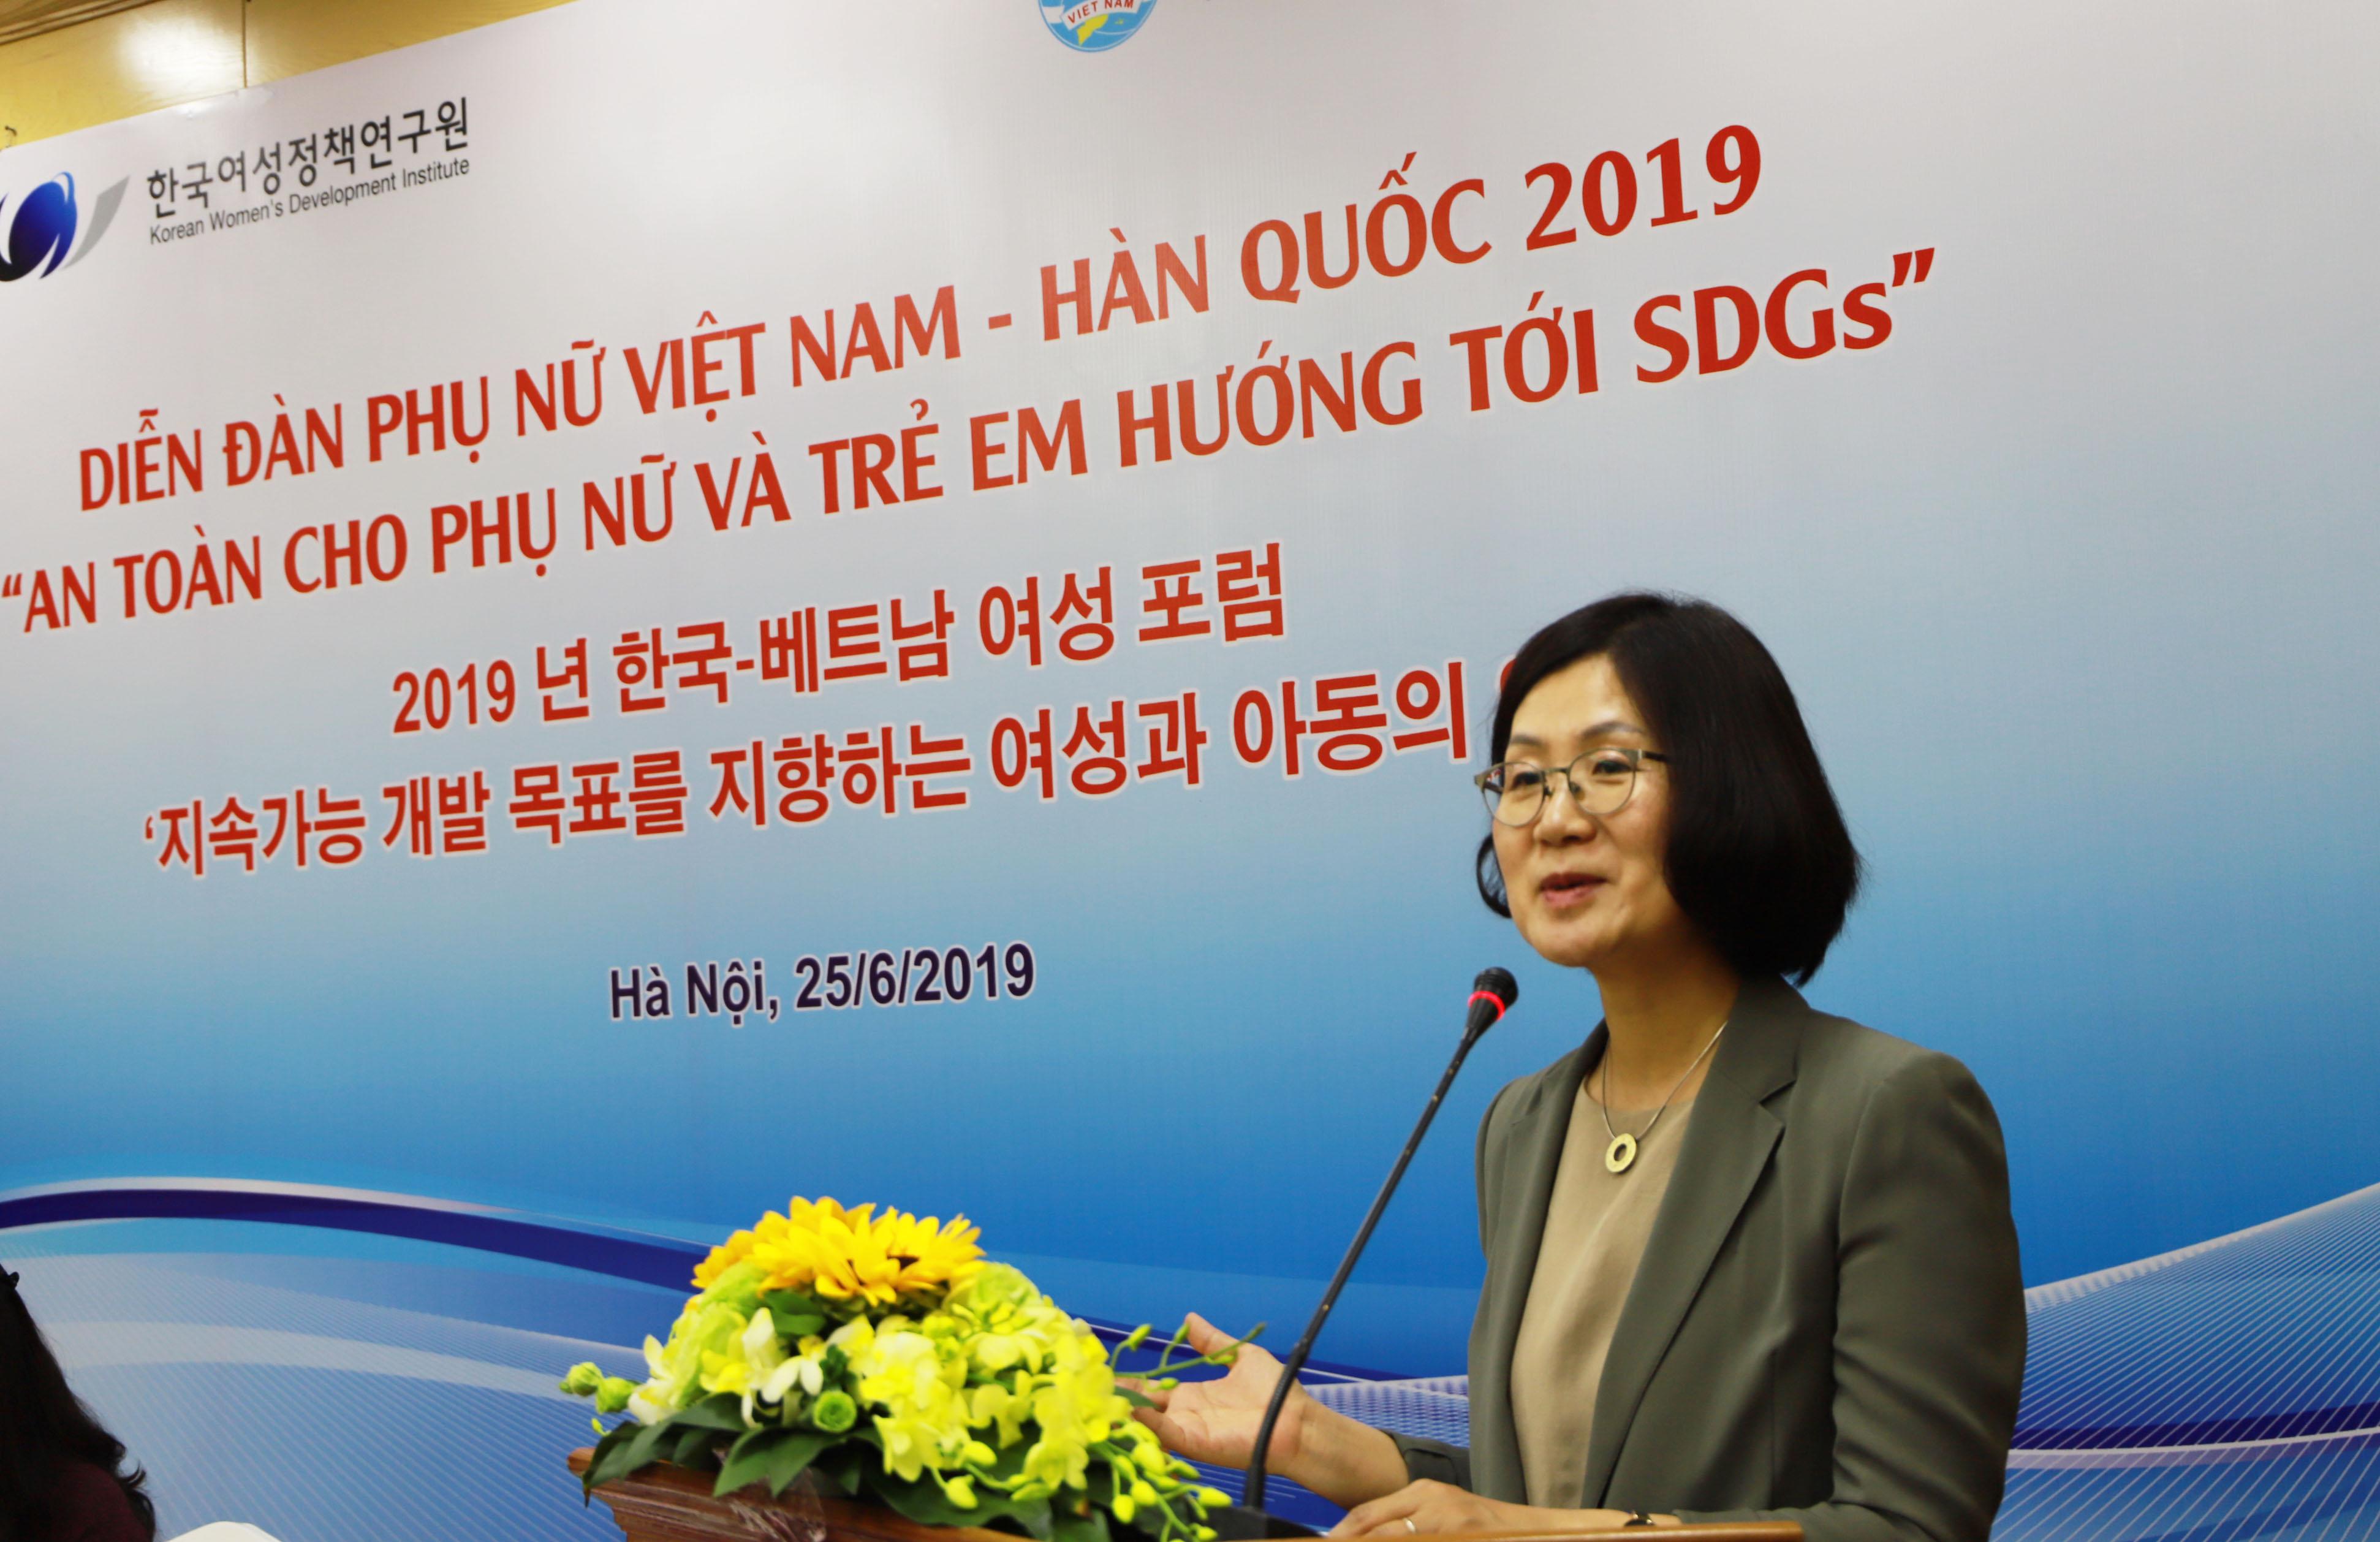 dien-dan-phu-nu-viet-nam-han-quoc-lan-thu-7-f.jpg